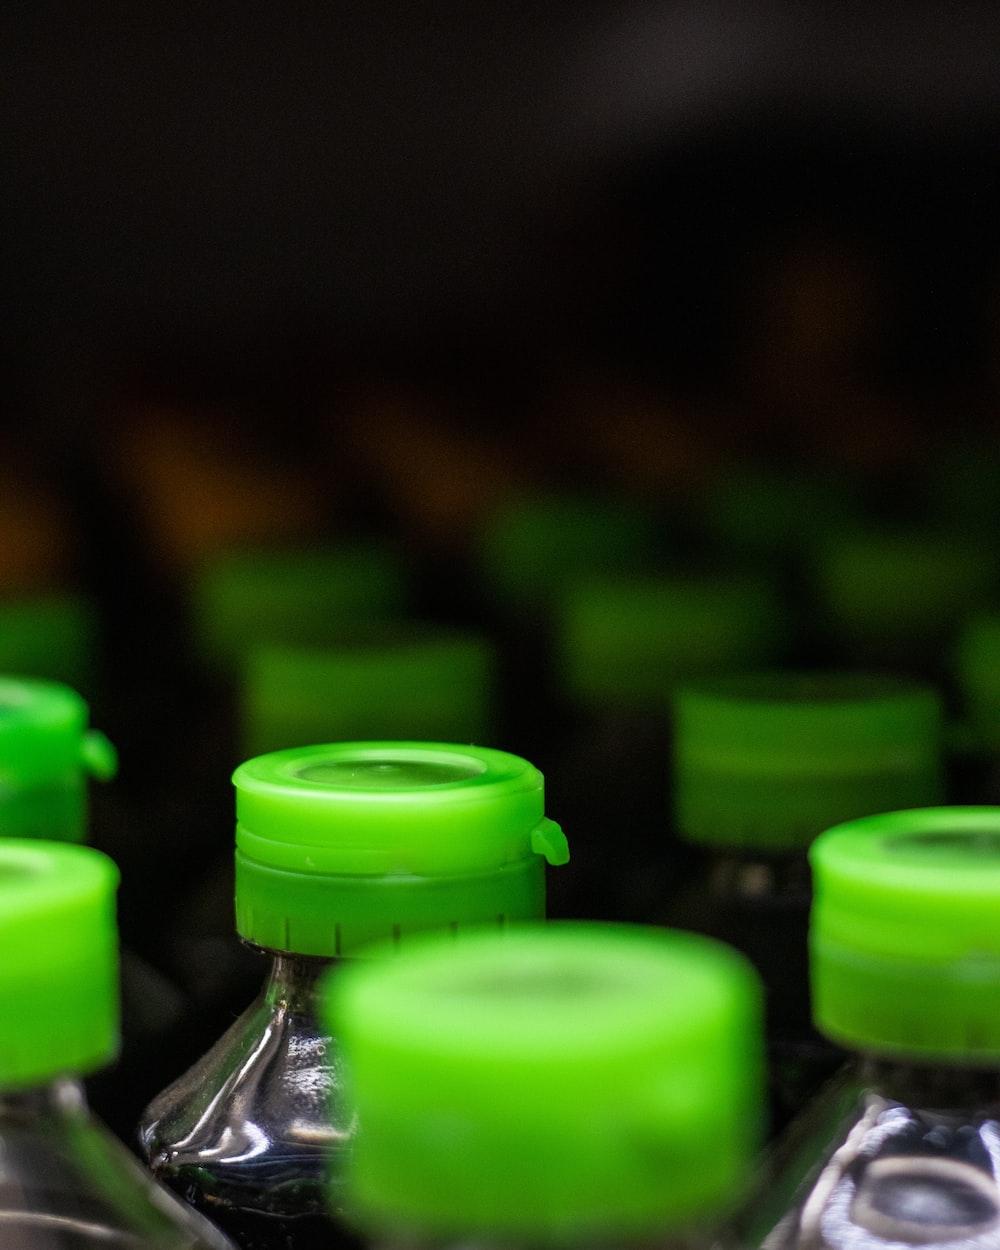 green plastic bottle cap lot